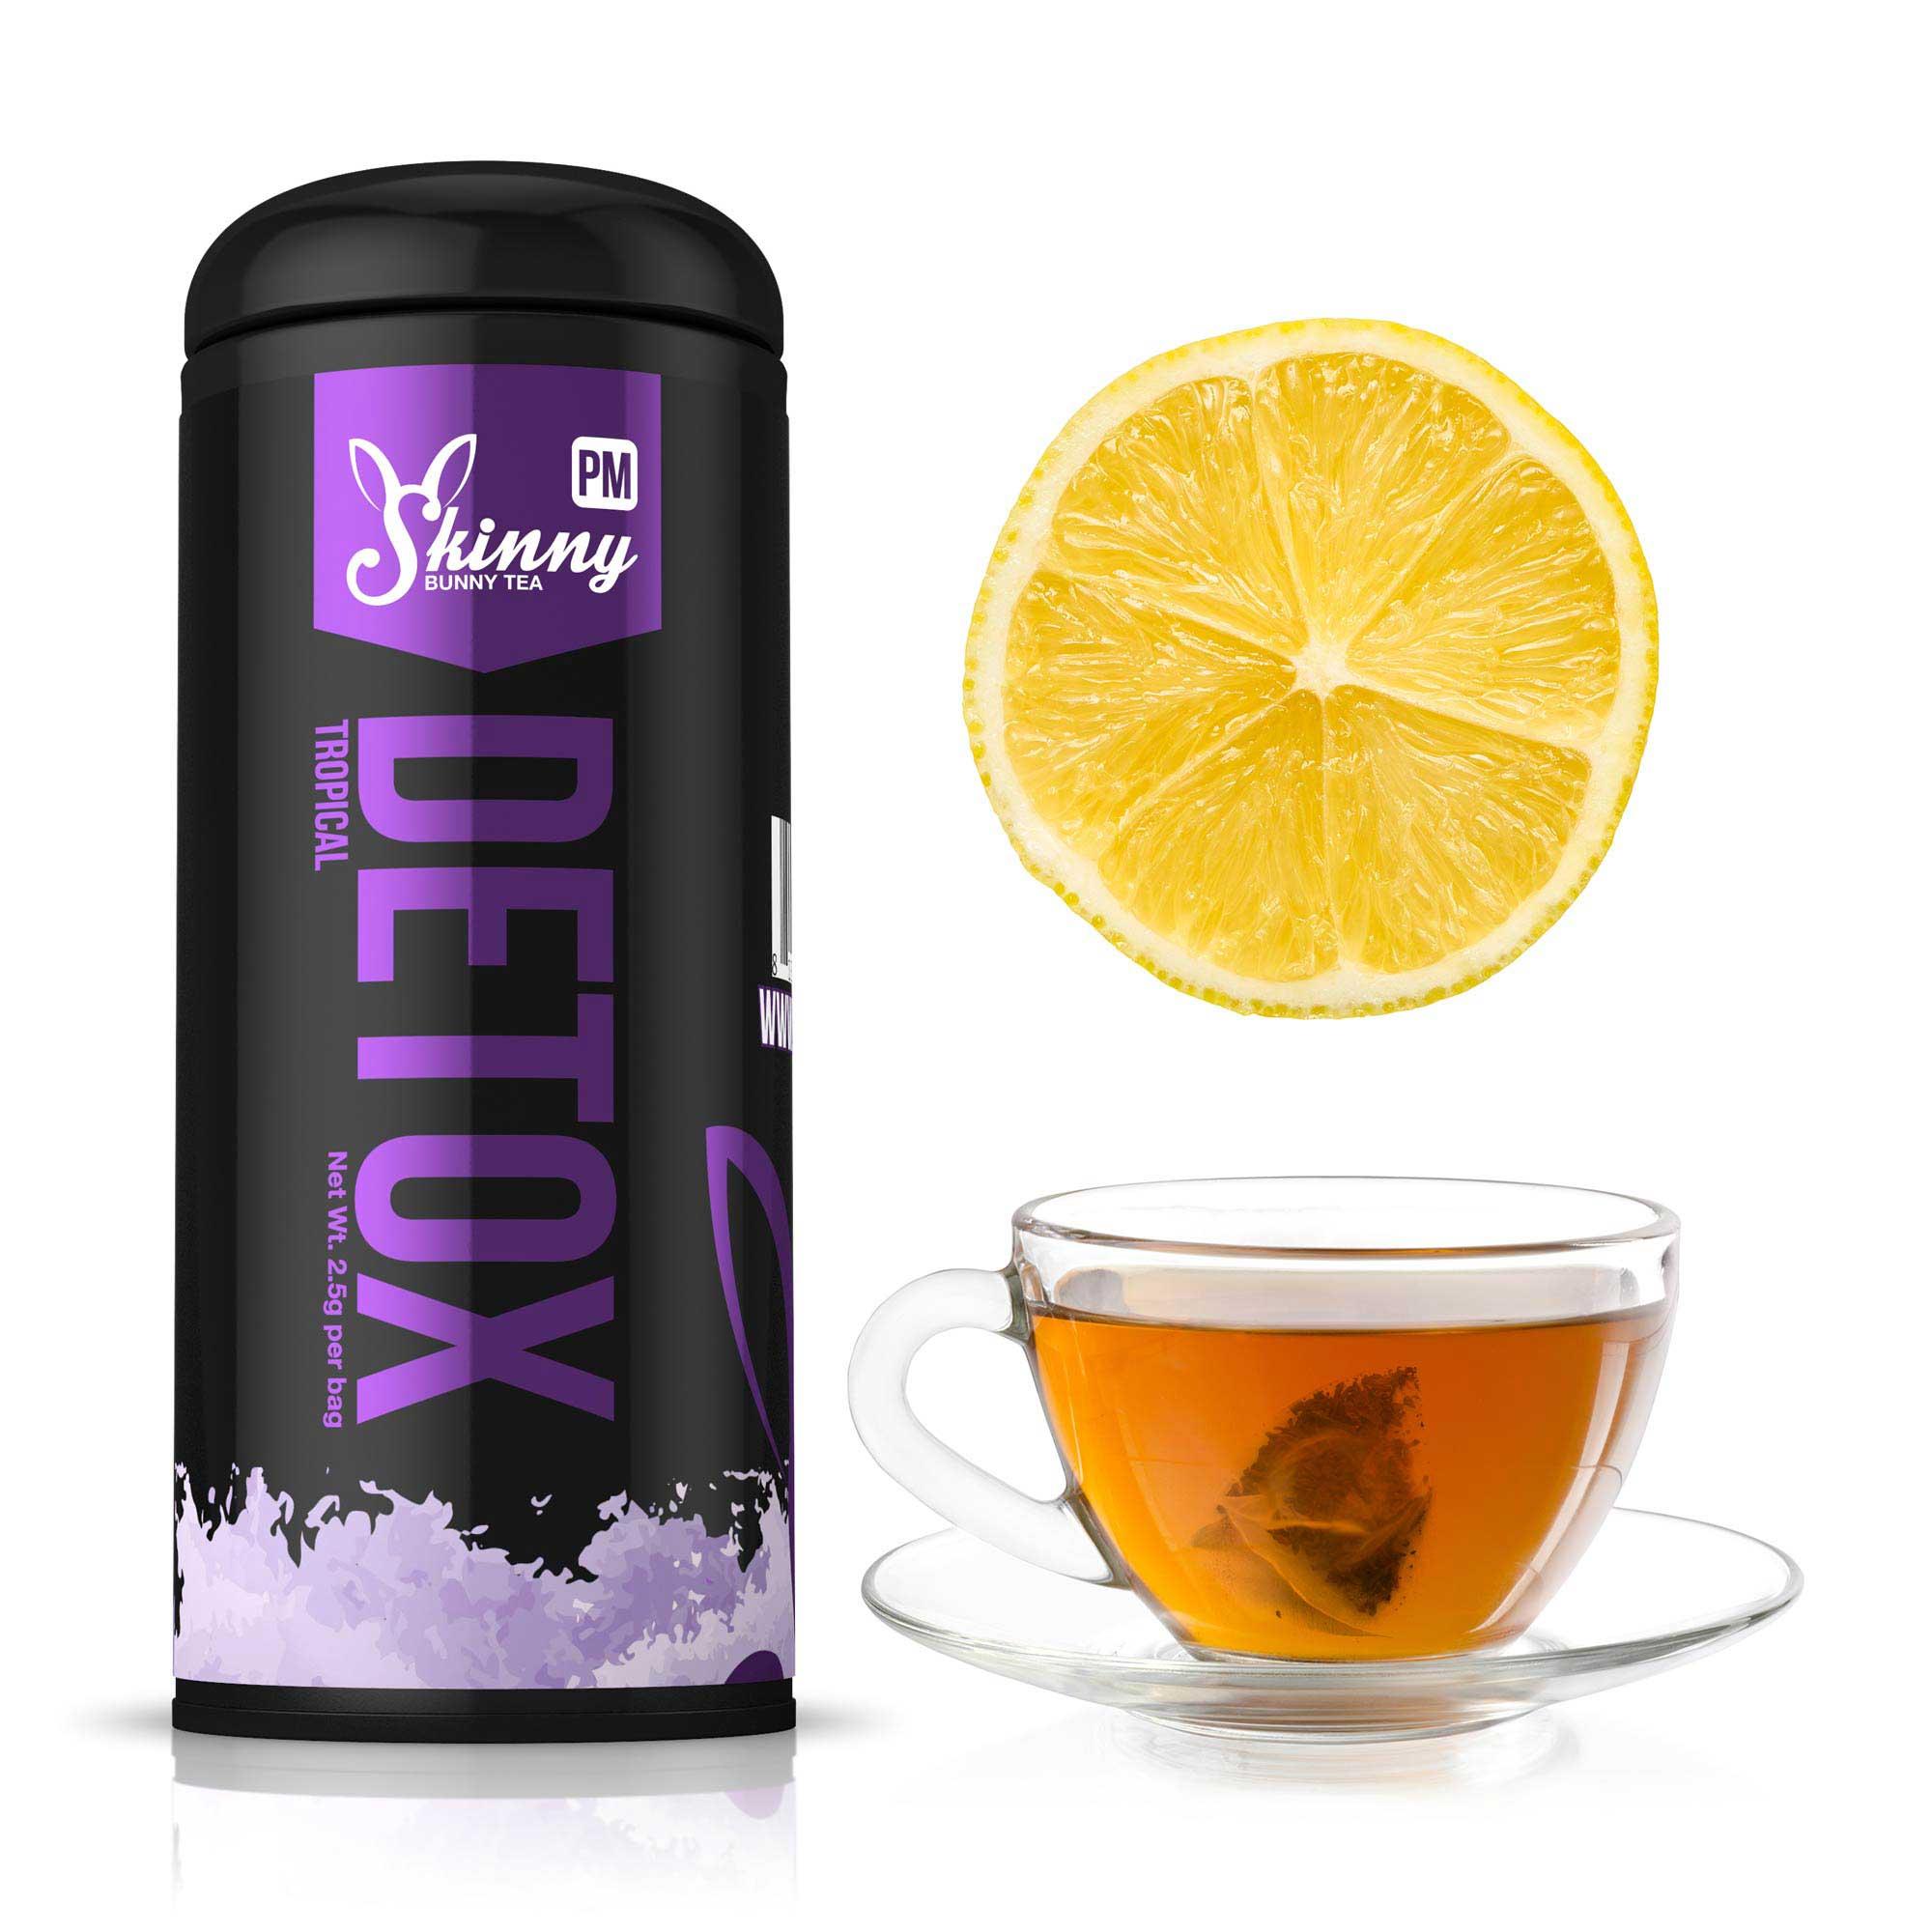 Skinny Bunny Tea: Detox